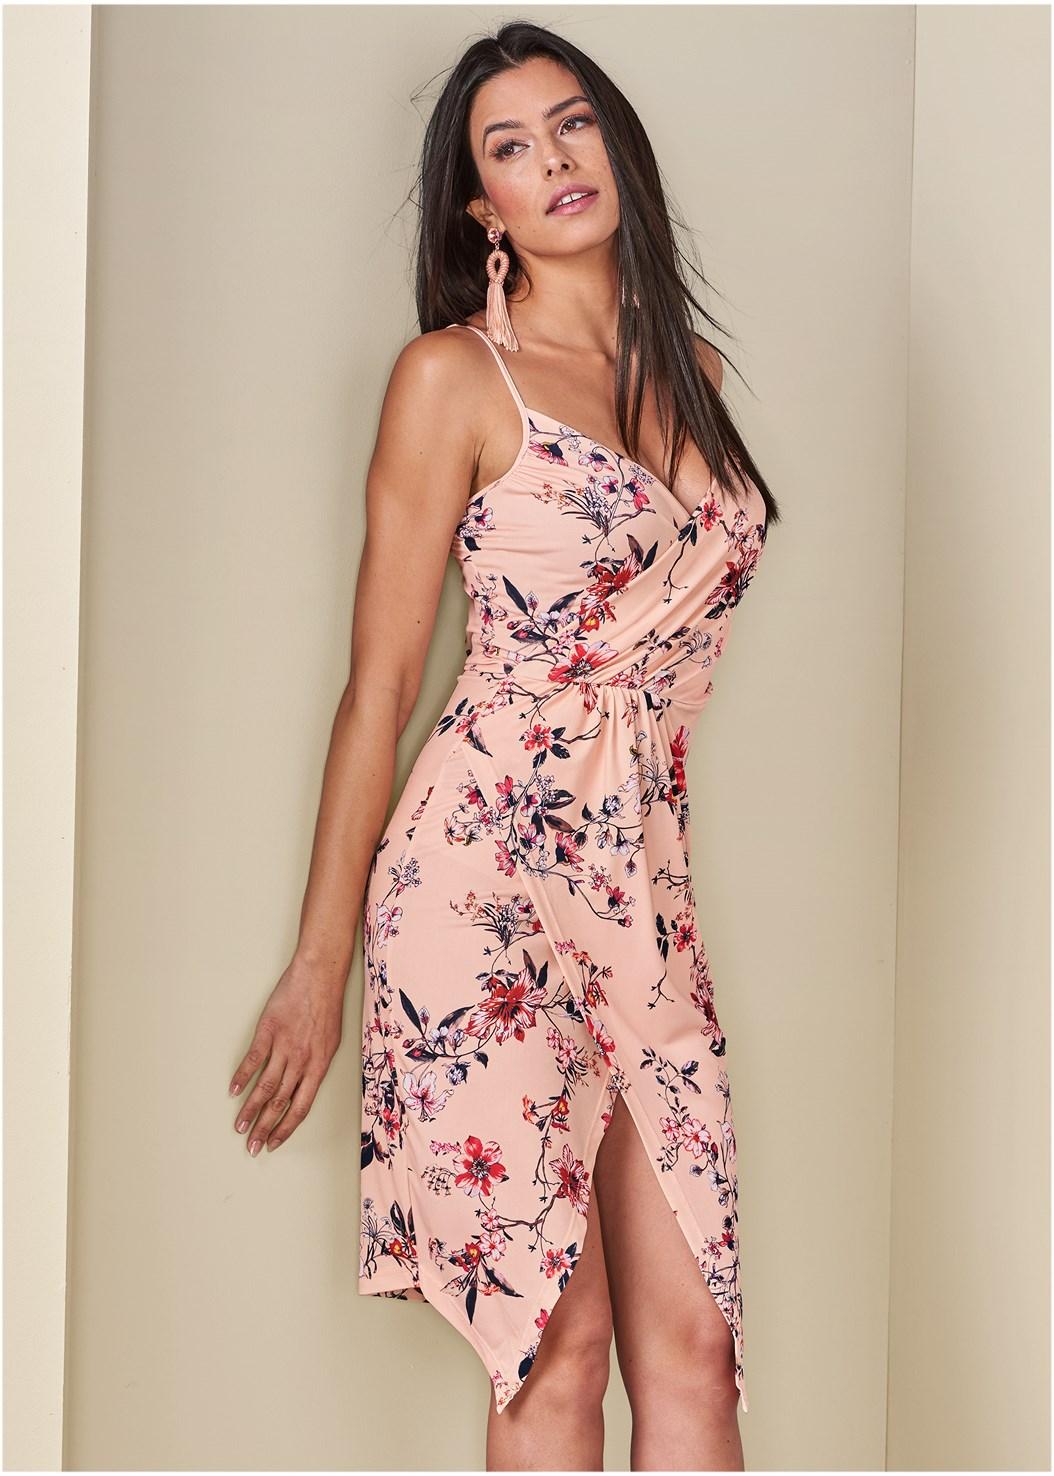 Floral Print Dress,Embellished Tassel Earrings,High Heel Strappy Sandals